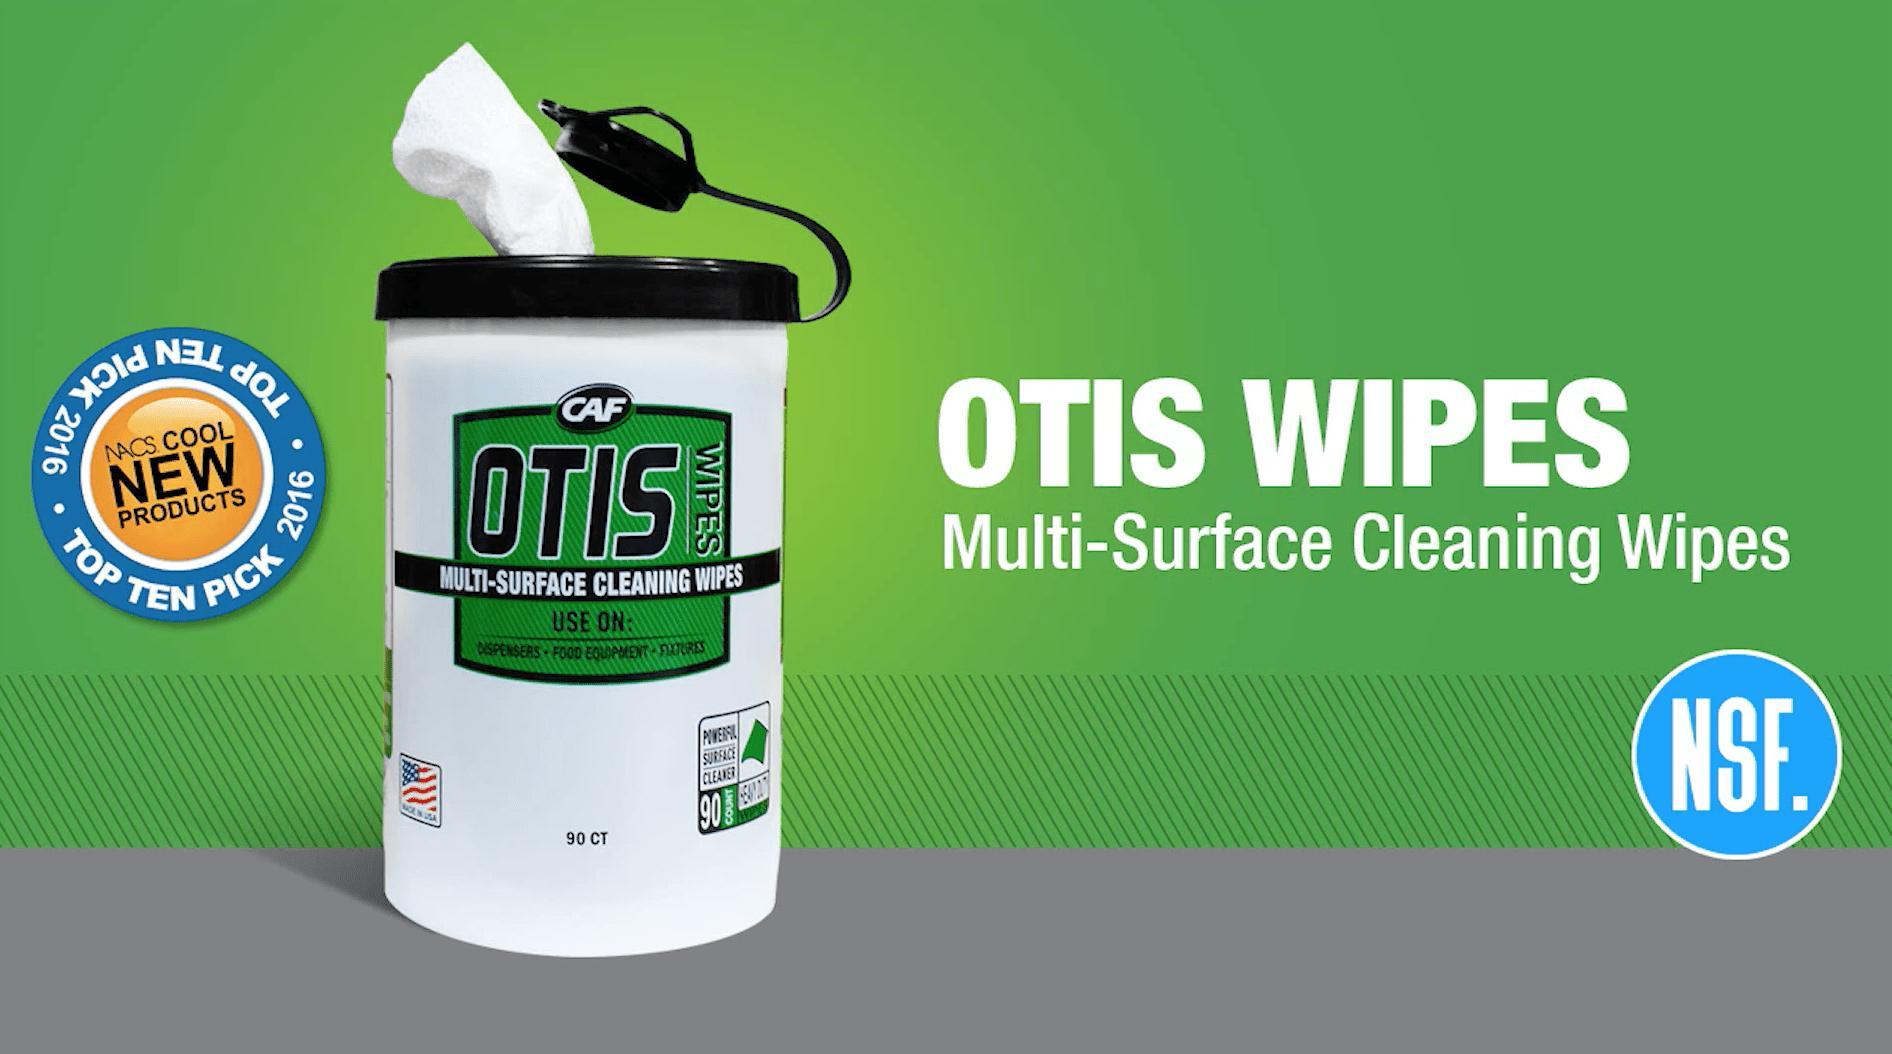 OTIS Wipes video